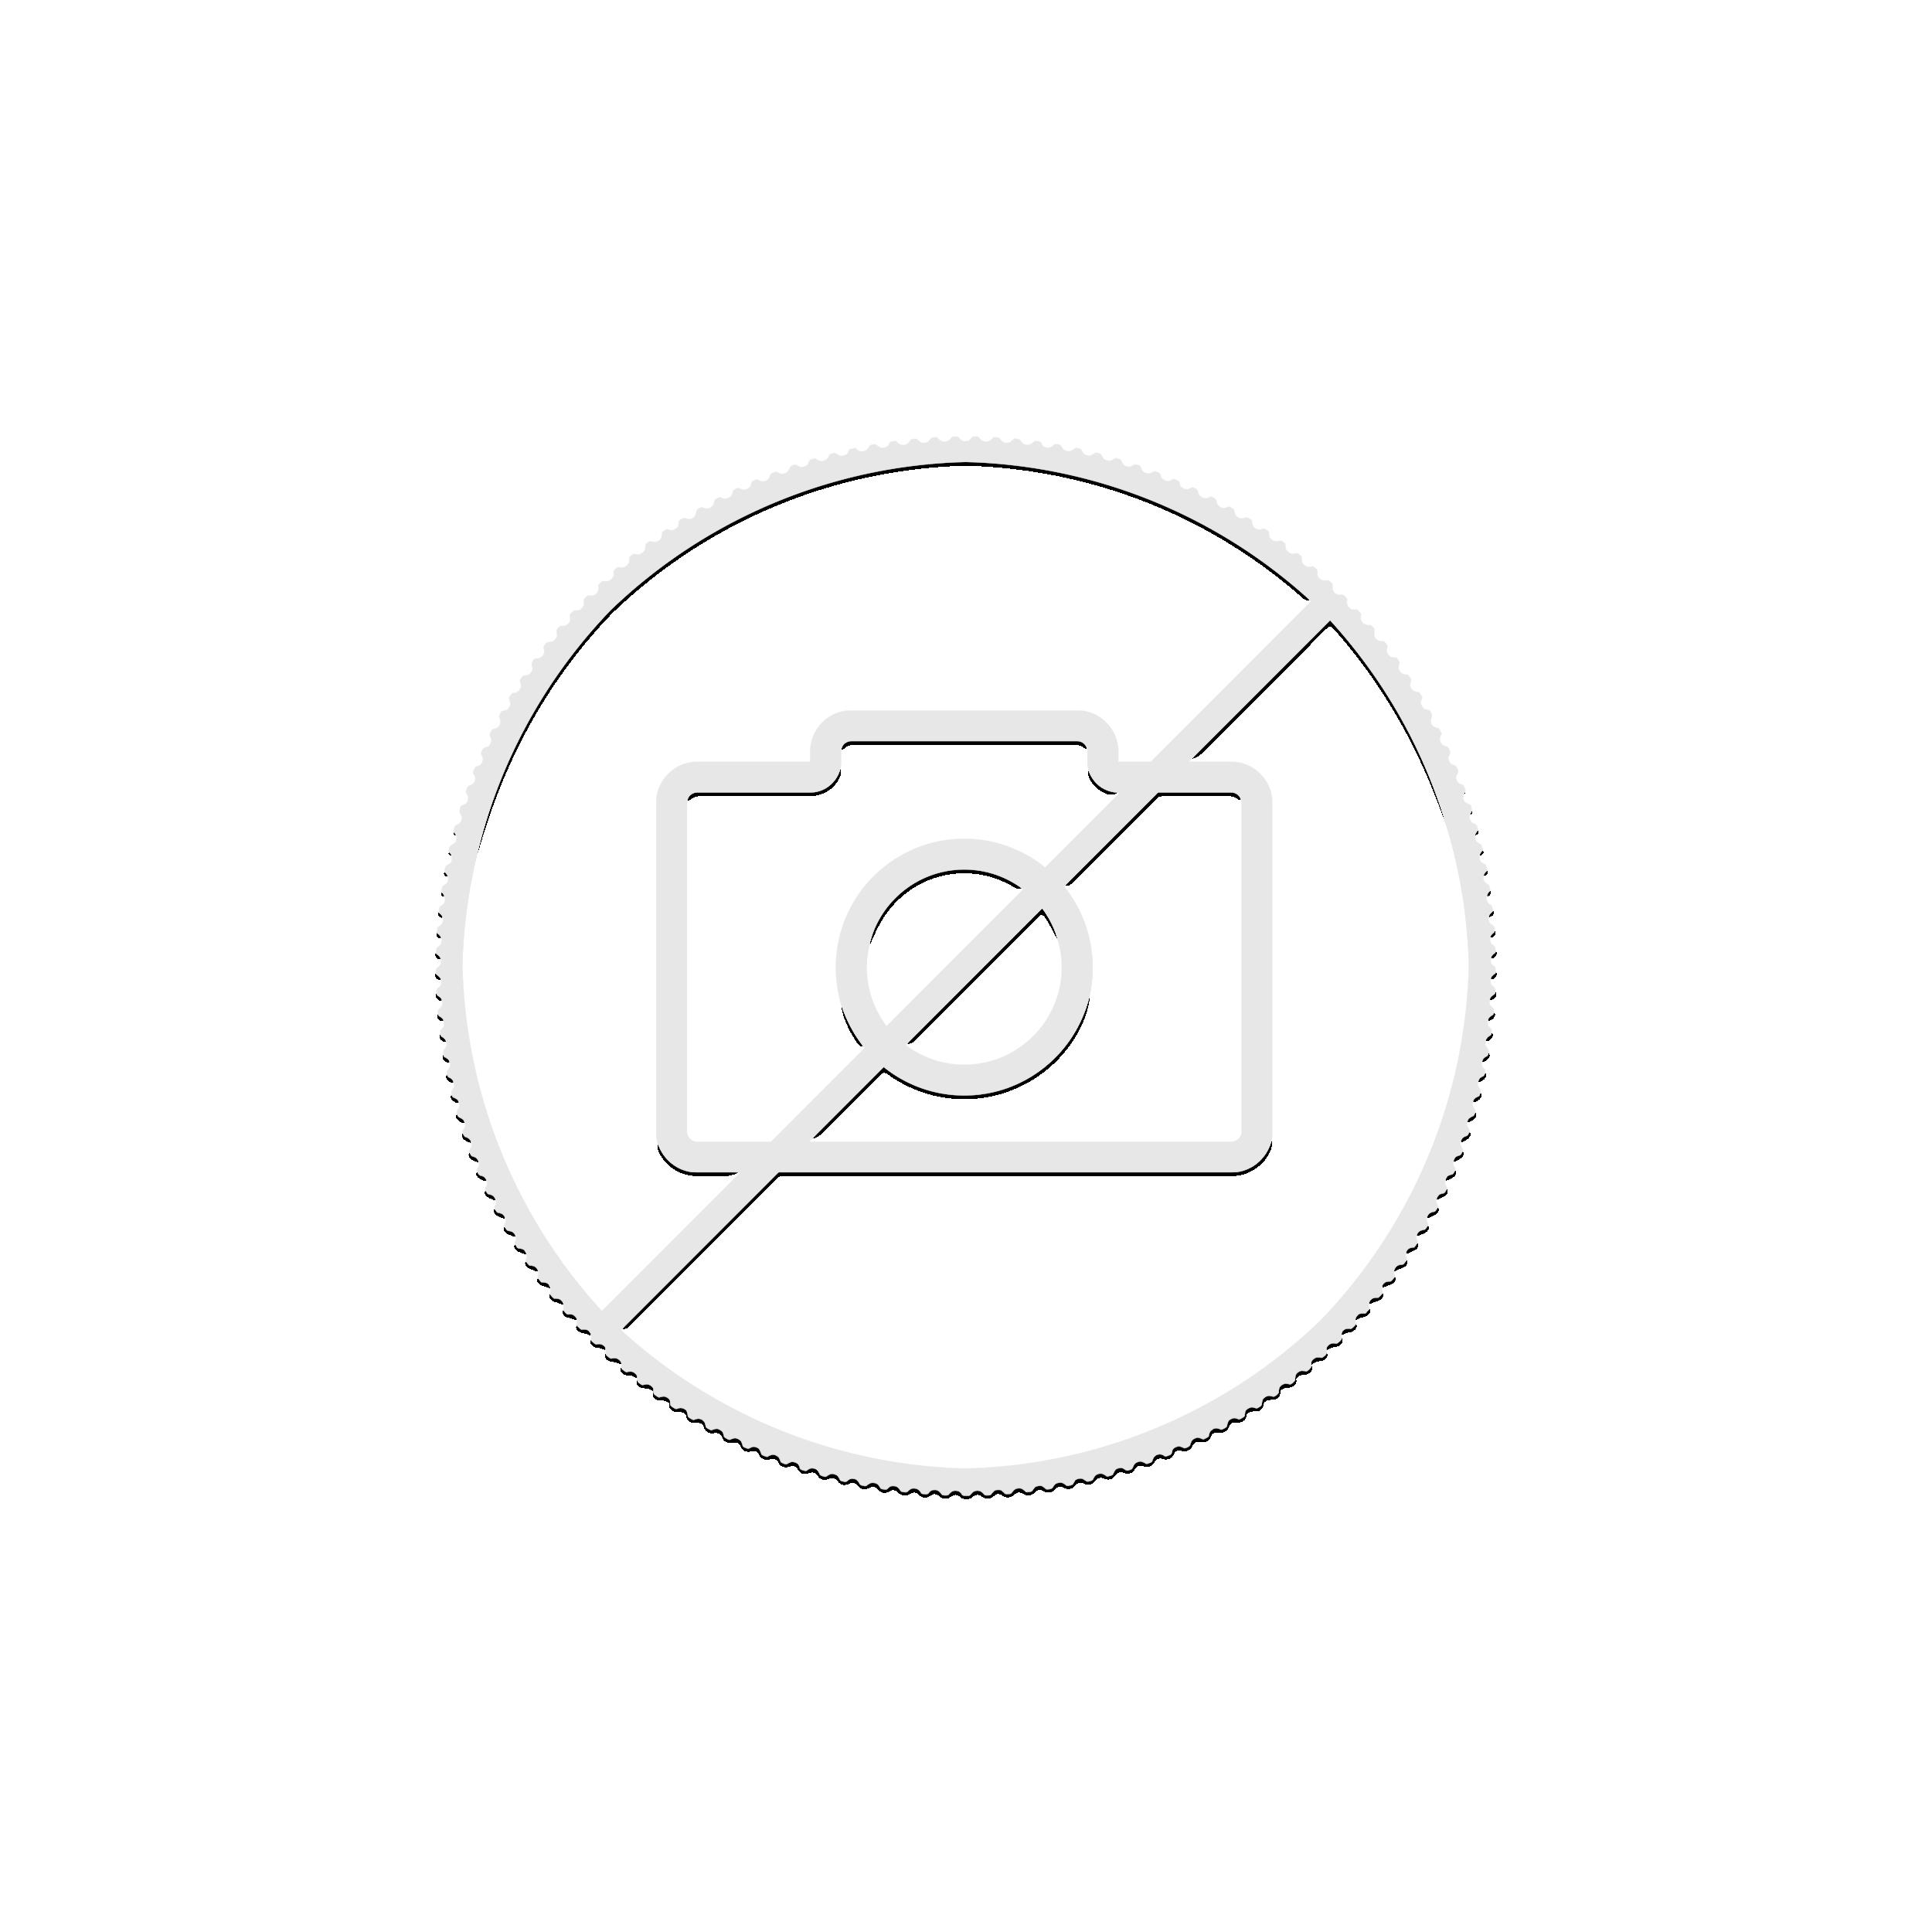 1 Troy ounce zilveren munt Disney - Carnival Minnie Mouse 2019